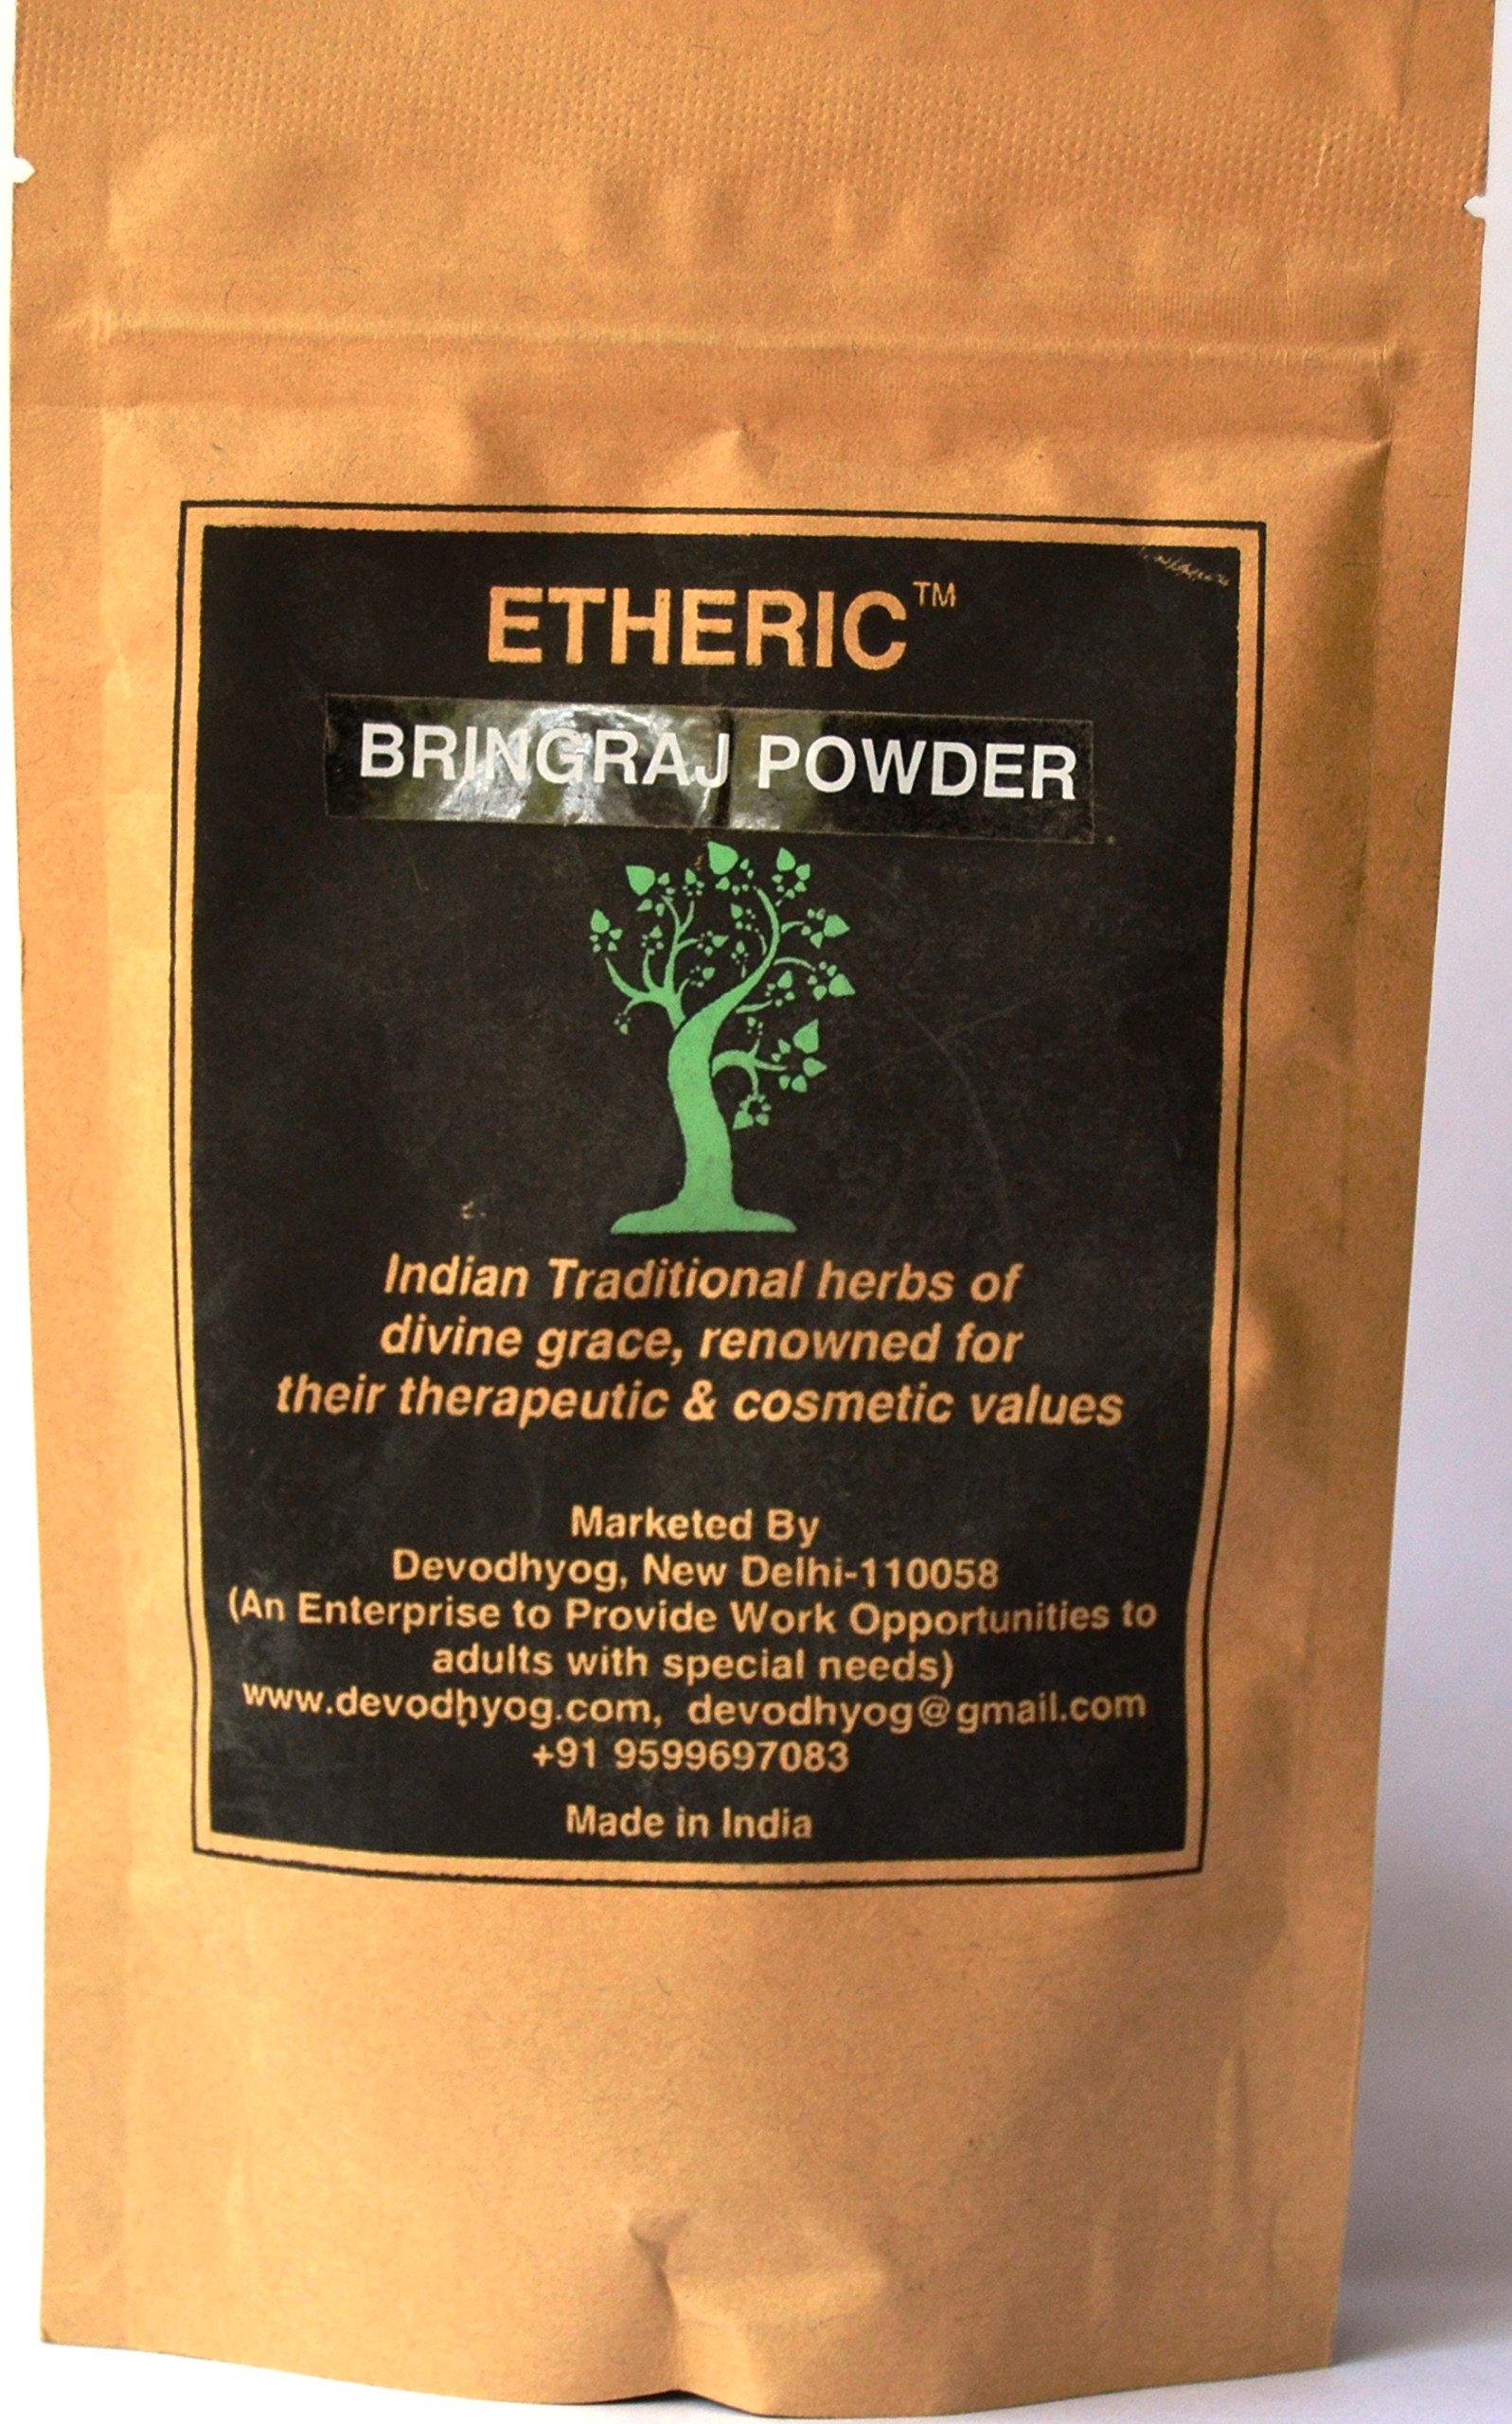 ETHERIC Bhringraj Powder for Hair product image